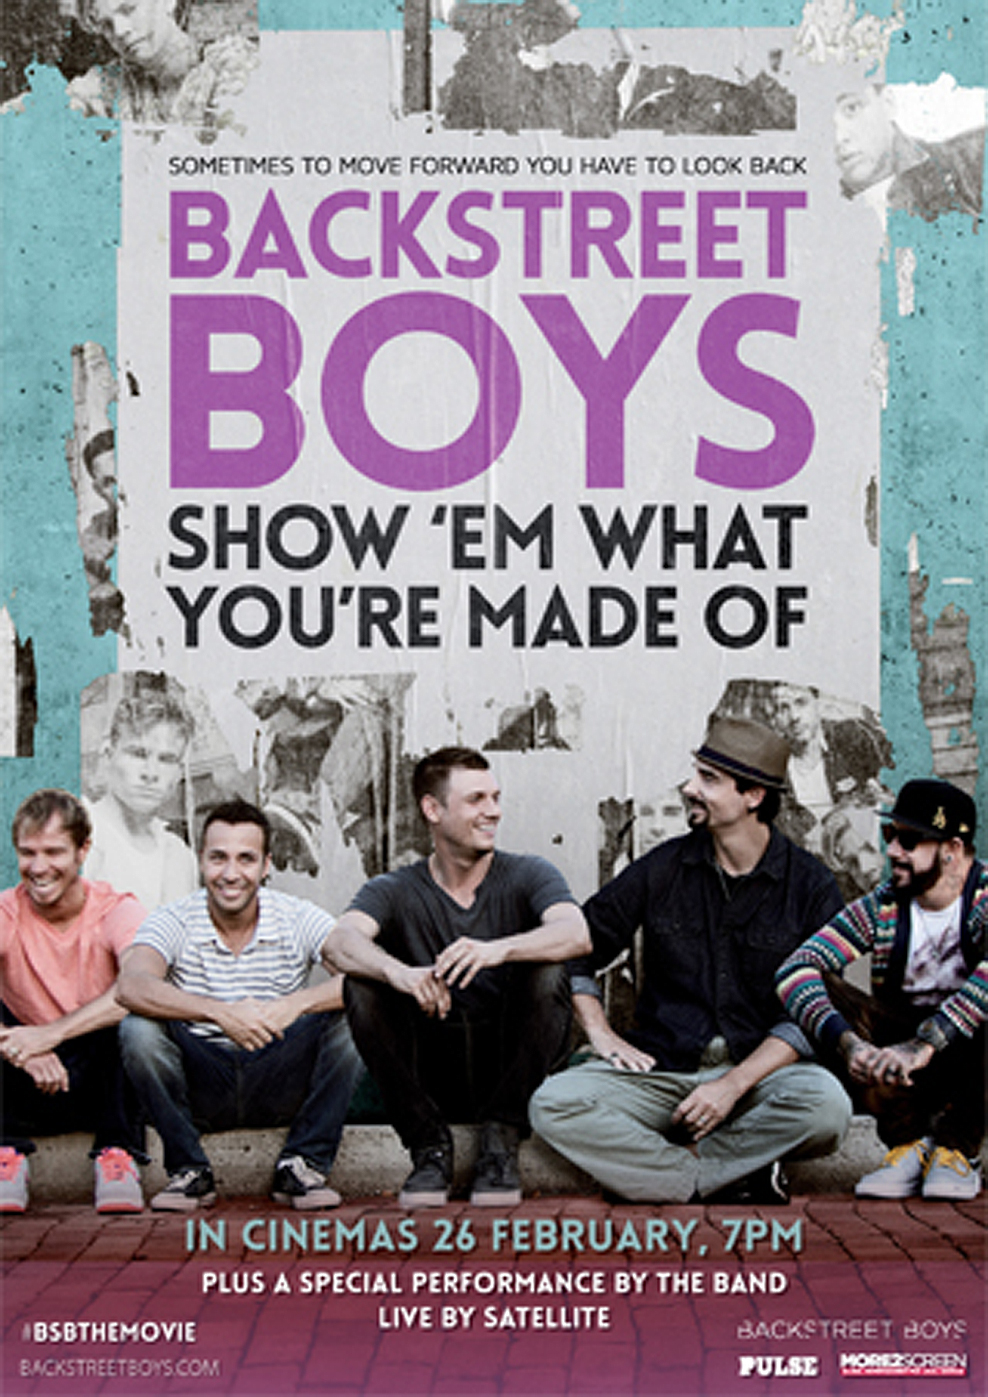 Backstreet Boys - Show 'Em What You're Made Of (Poster)